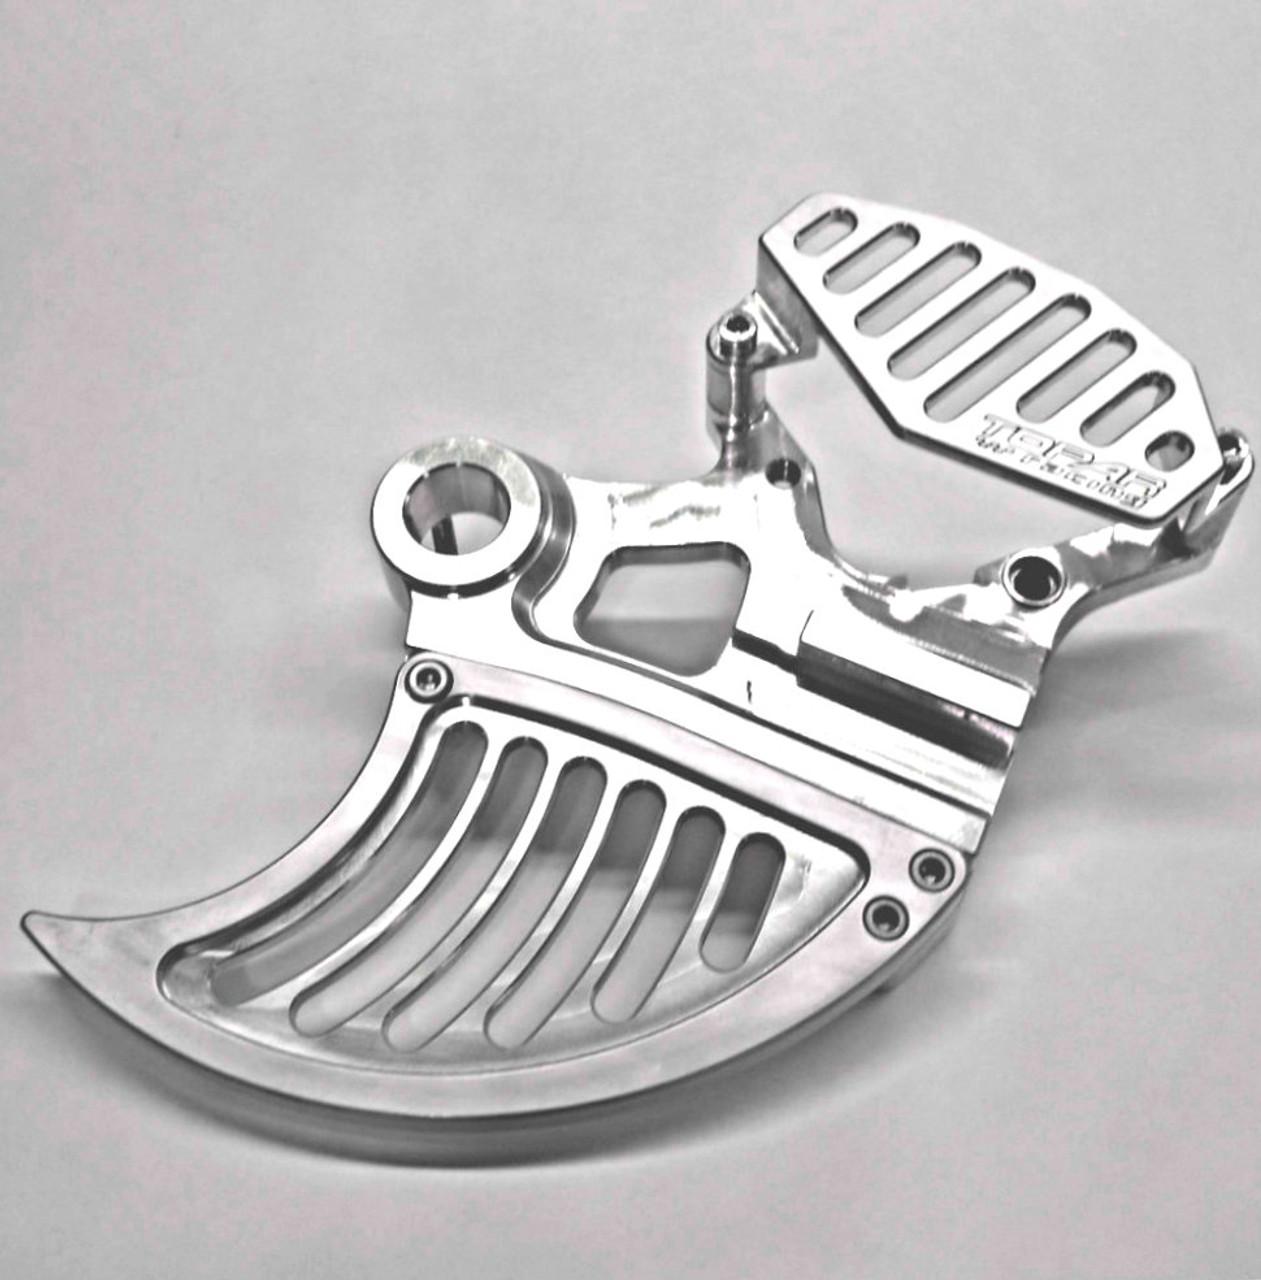 Topar Racing Rear Brake Disc Rotor Guard For All  2006-2020 YAMAHA 125cc-450cc (YZ,YZF,YZX,YZFX,WR,WRF) 2019 YZ250F (20mm or 25mmAxle Diameter) - ( Shown with Optional Caliper Guard and Aluminum Fin)